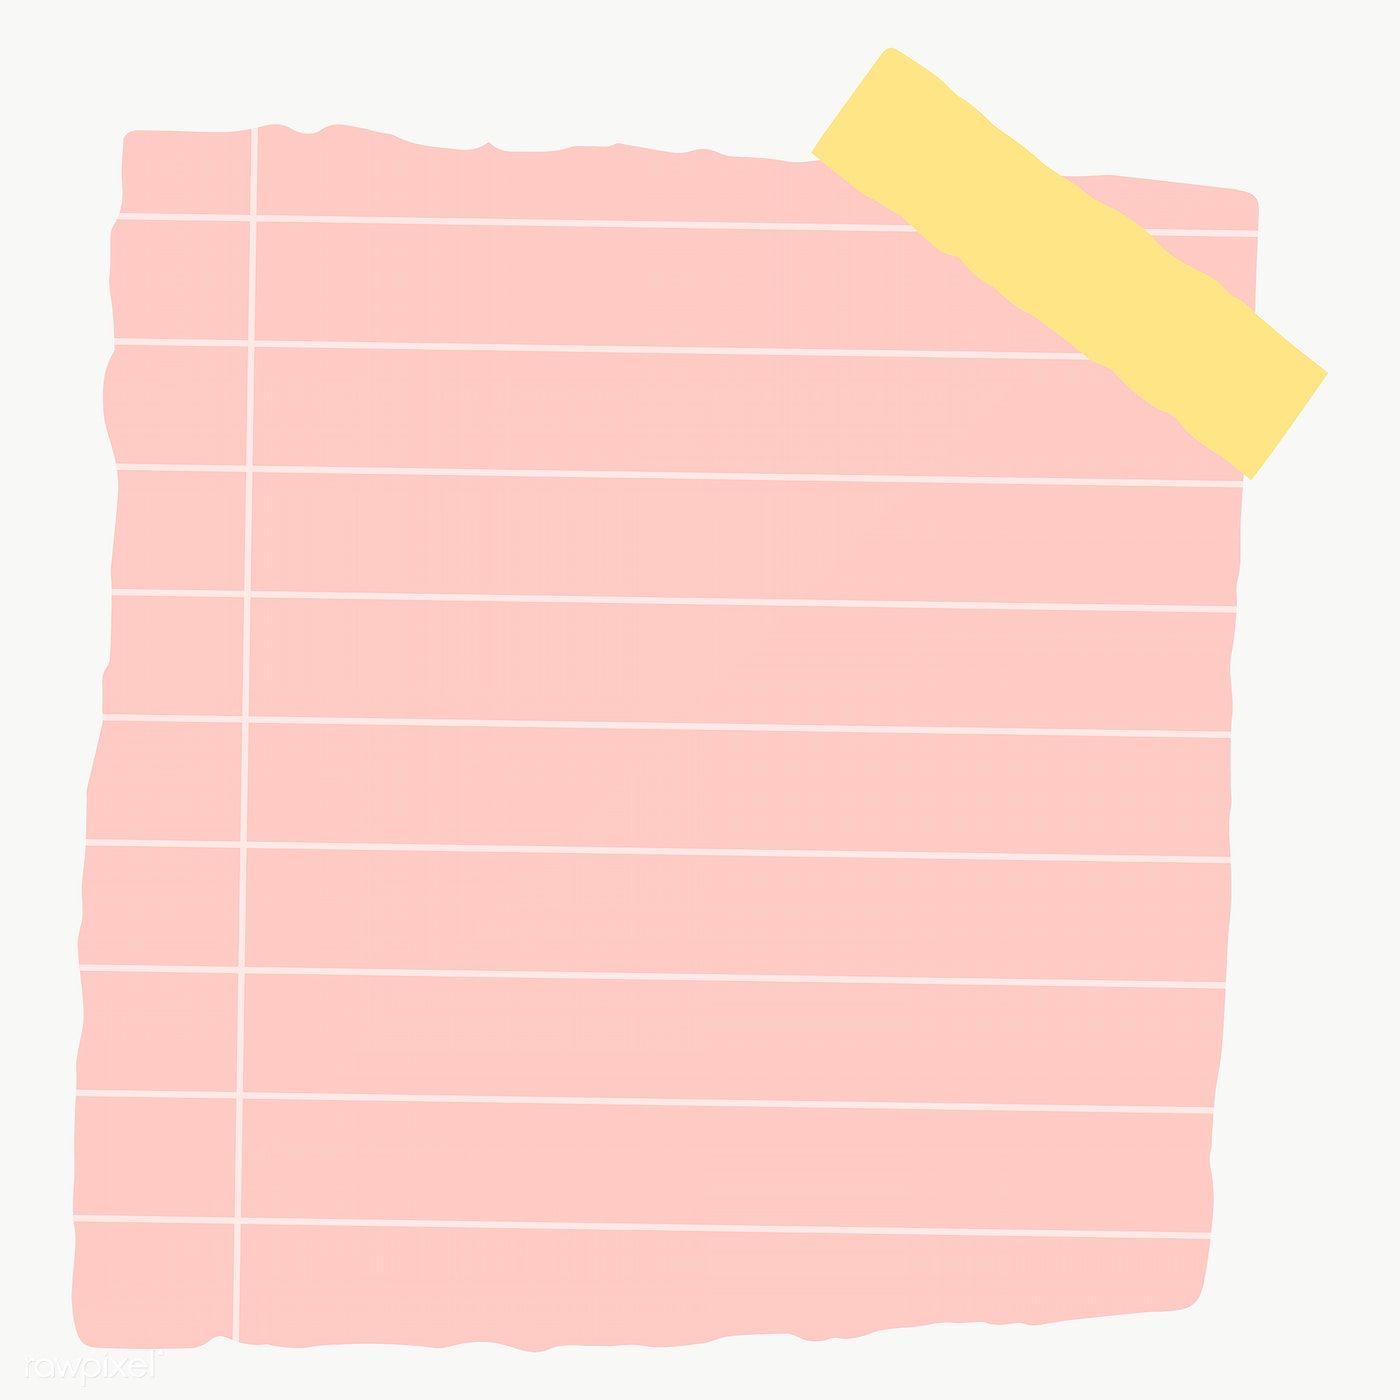 Pink Square Paper Note Social Ads Template Transparent Png Free Image By Rawpixel Com Manotang Libre De Vectores Libreta De Apuntes Marcos Para Texto